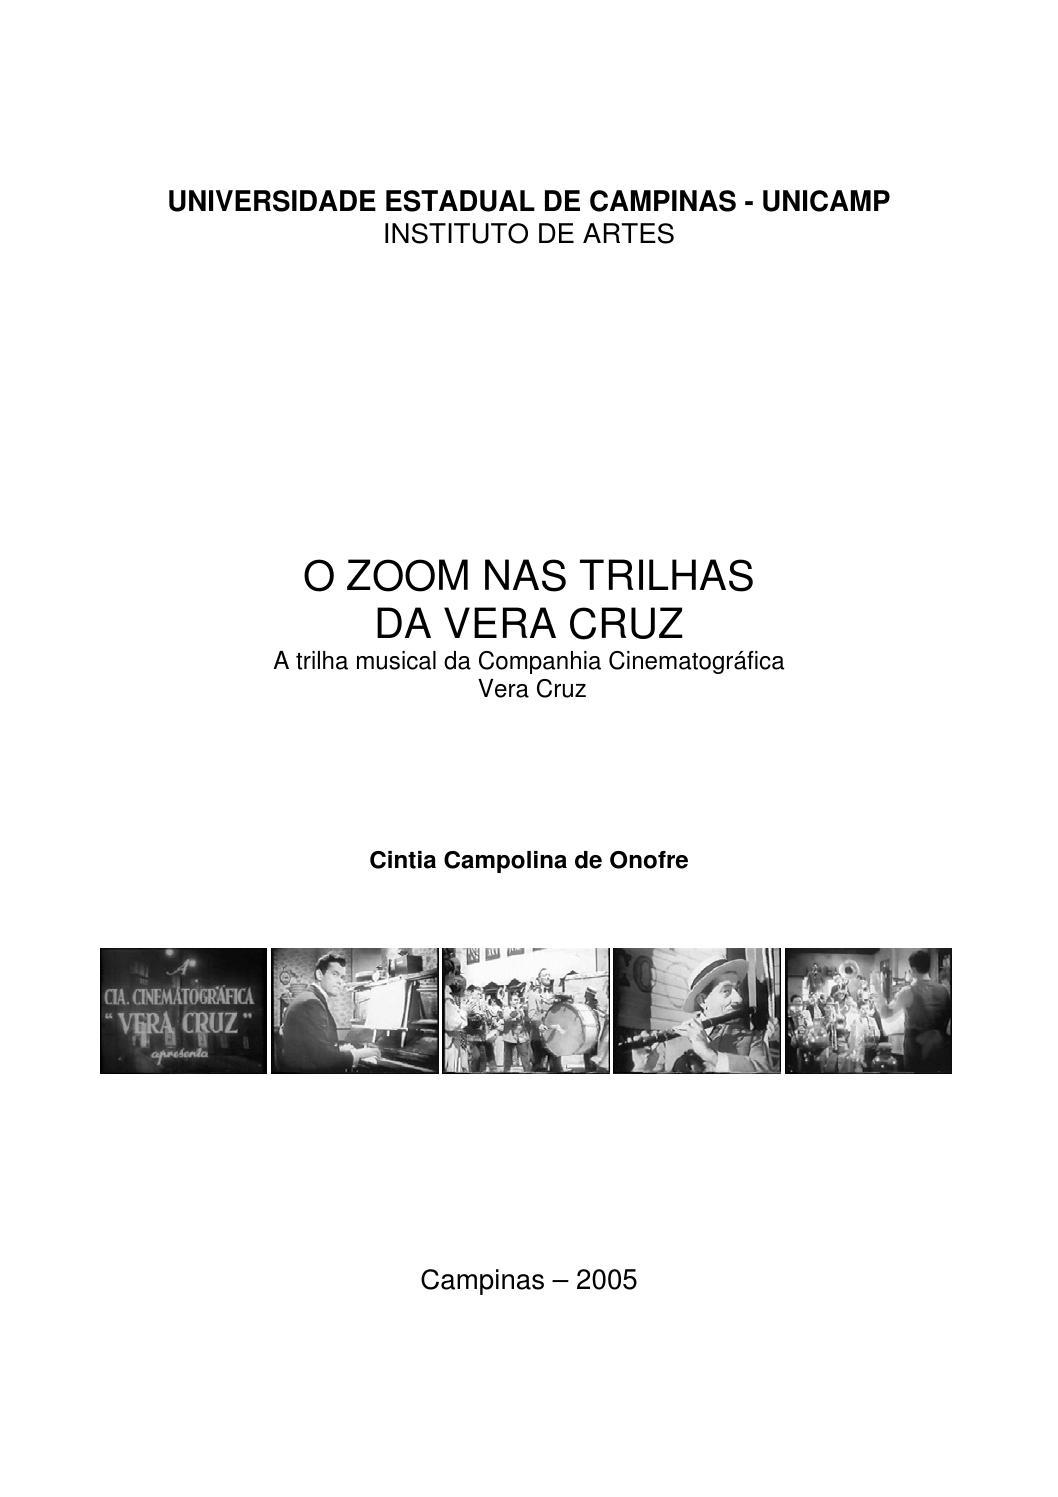 c22ec8633b99b Cintia Campolina de Onofre by SP Escola de Teatro - issuu